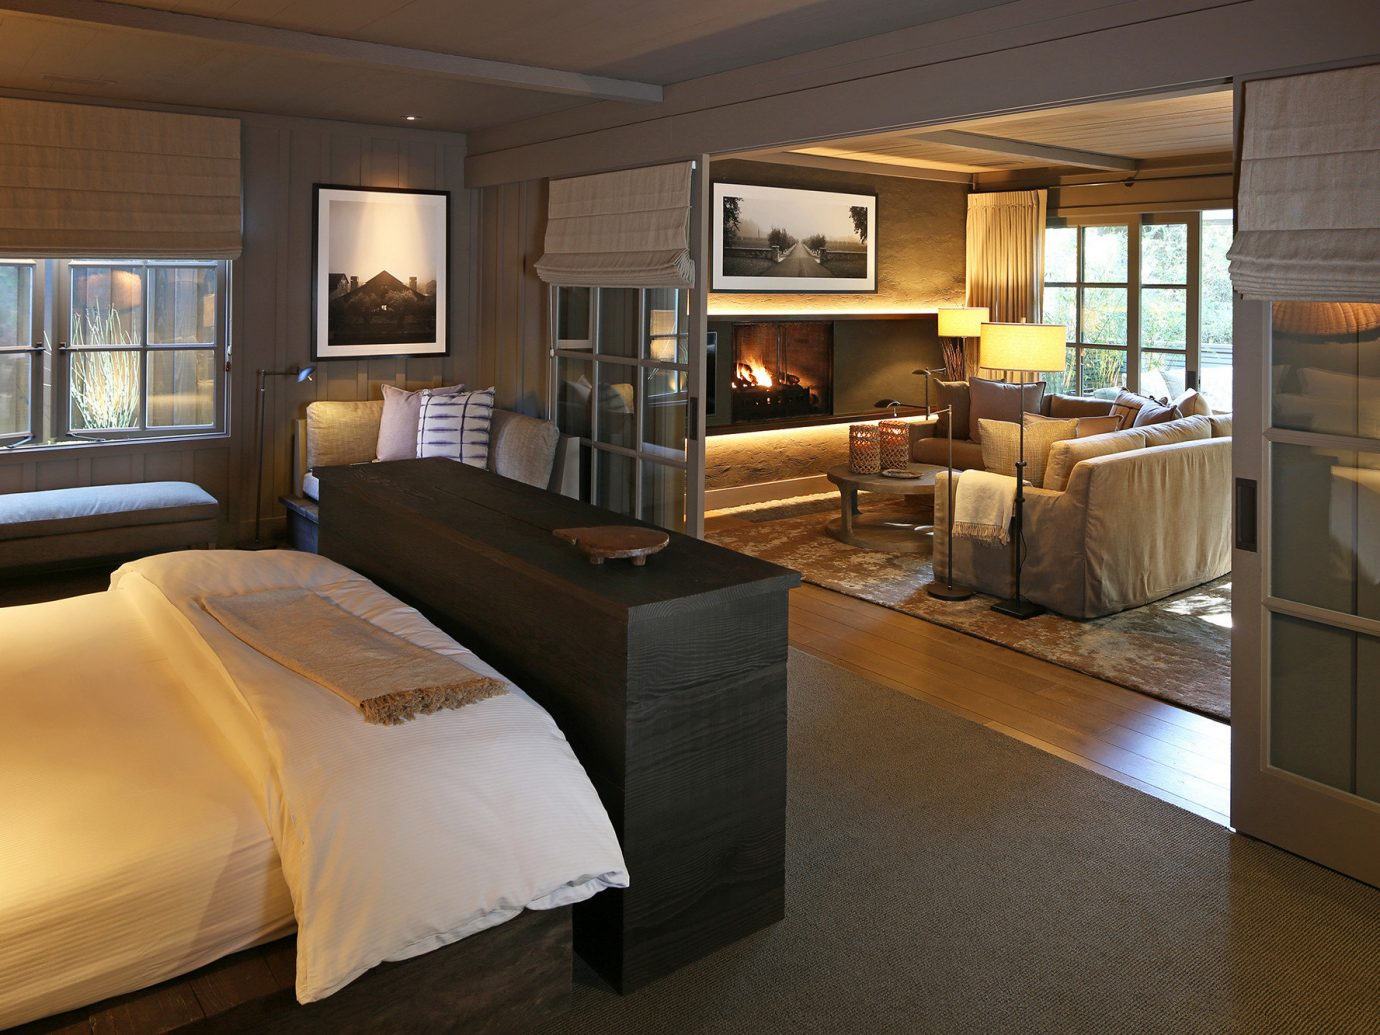 Bedroom at Meadowood Napa Valley